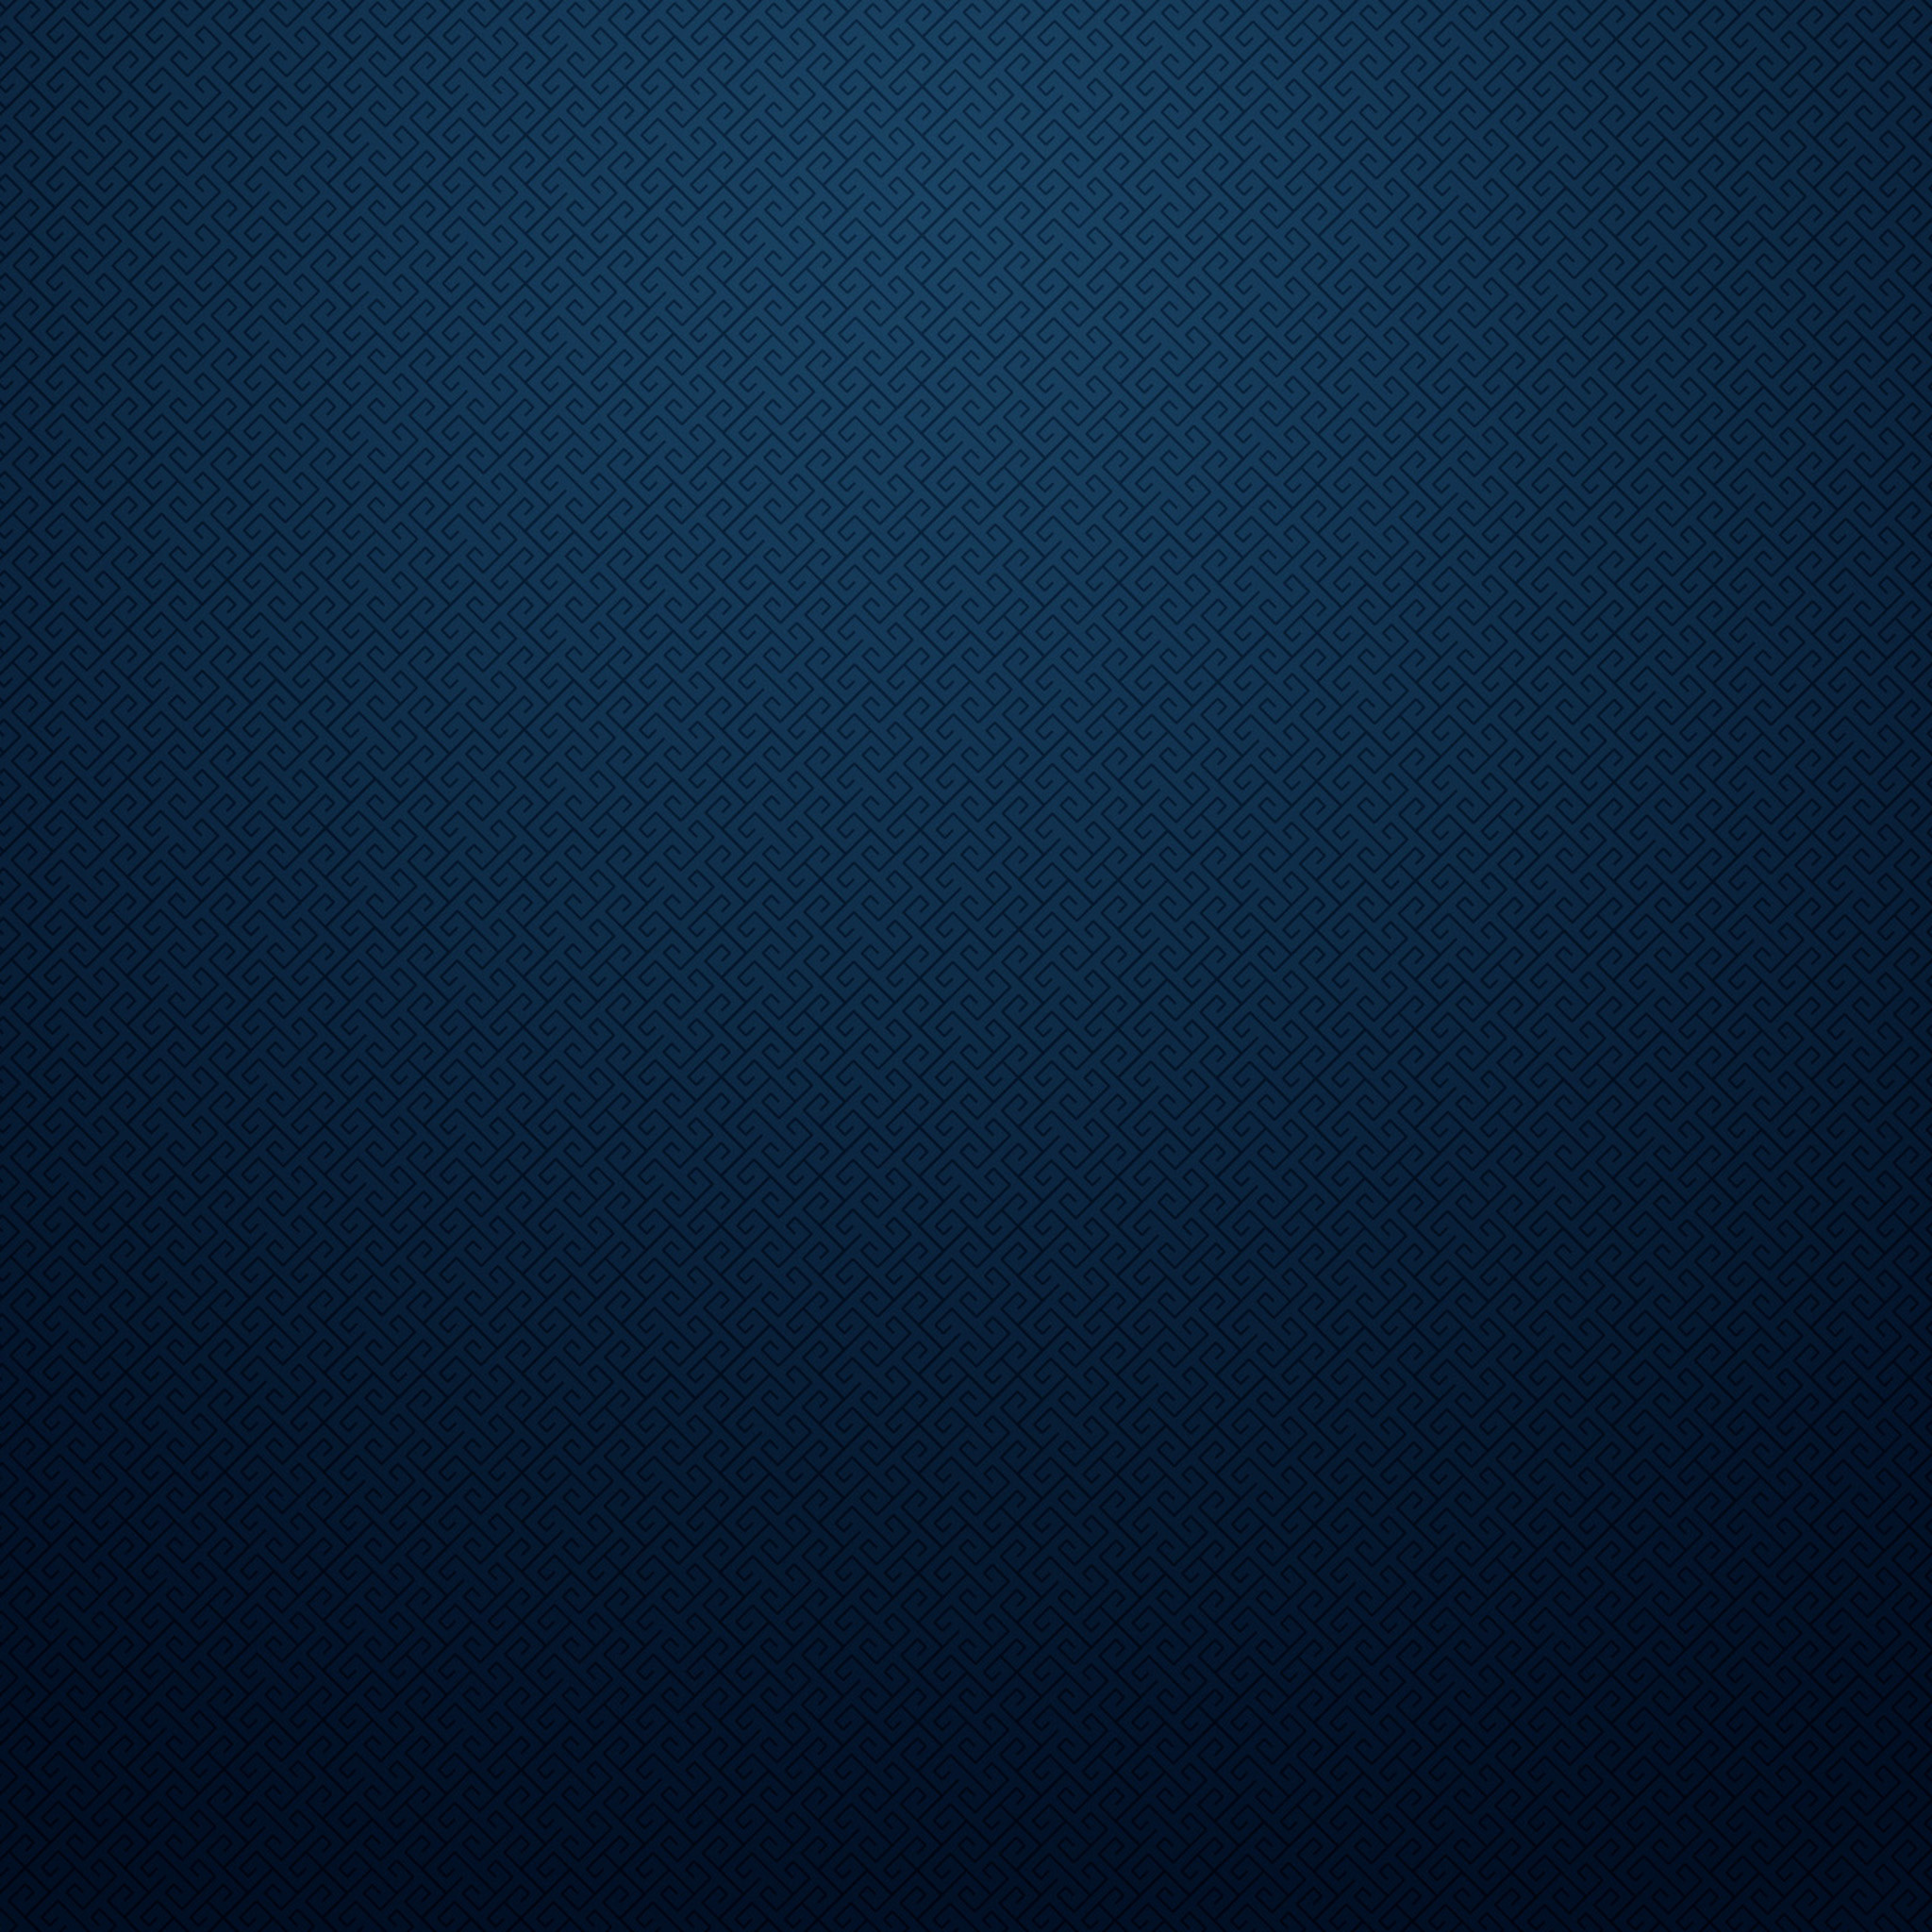 Navy Dark Blue Wandfarbe: Navy Blue Background (37+ Images